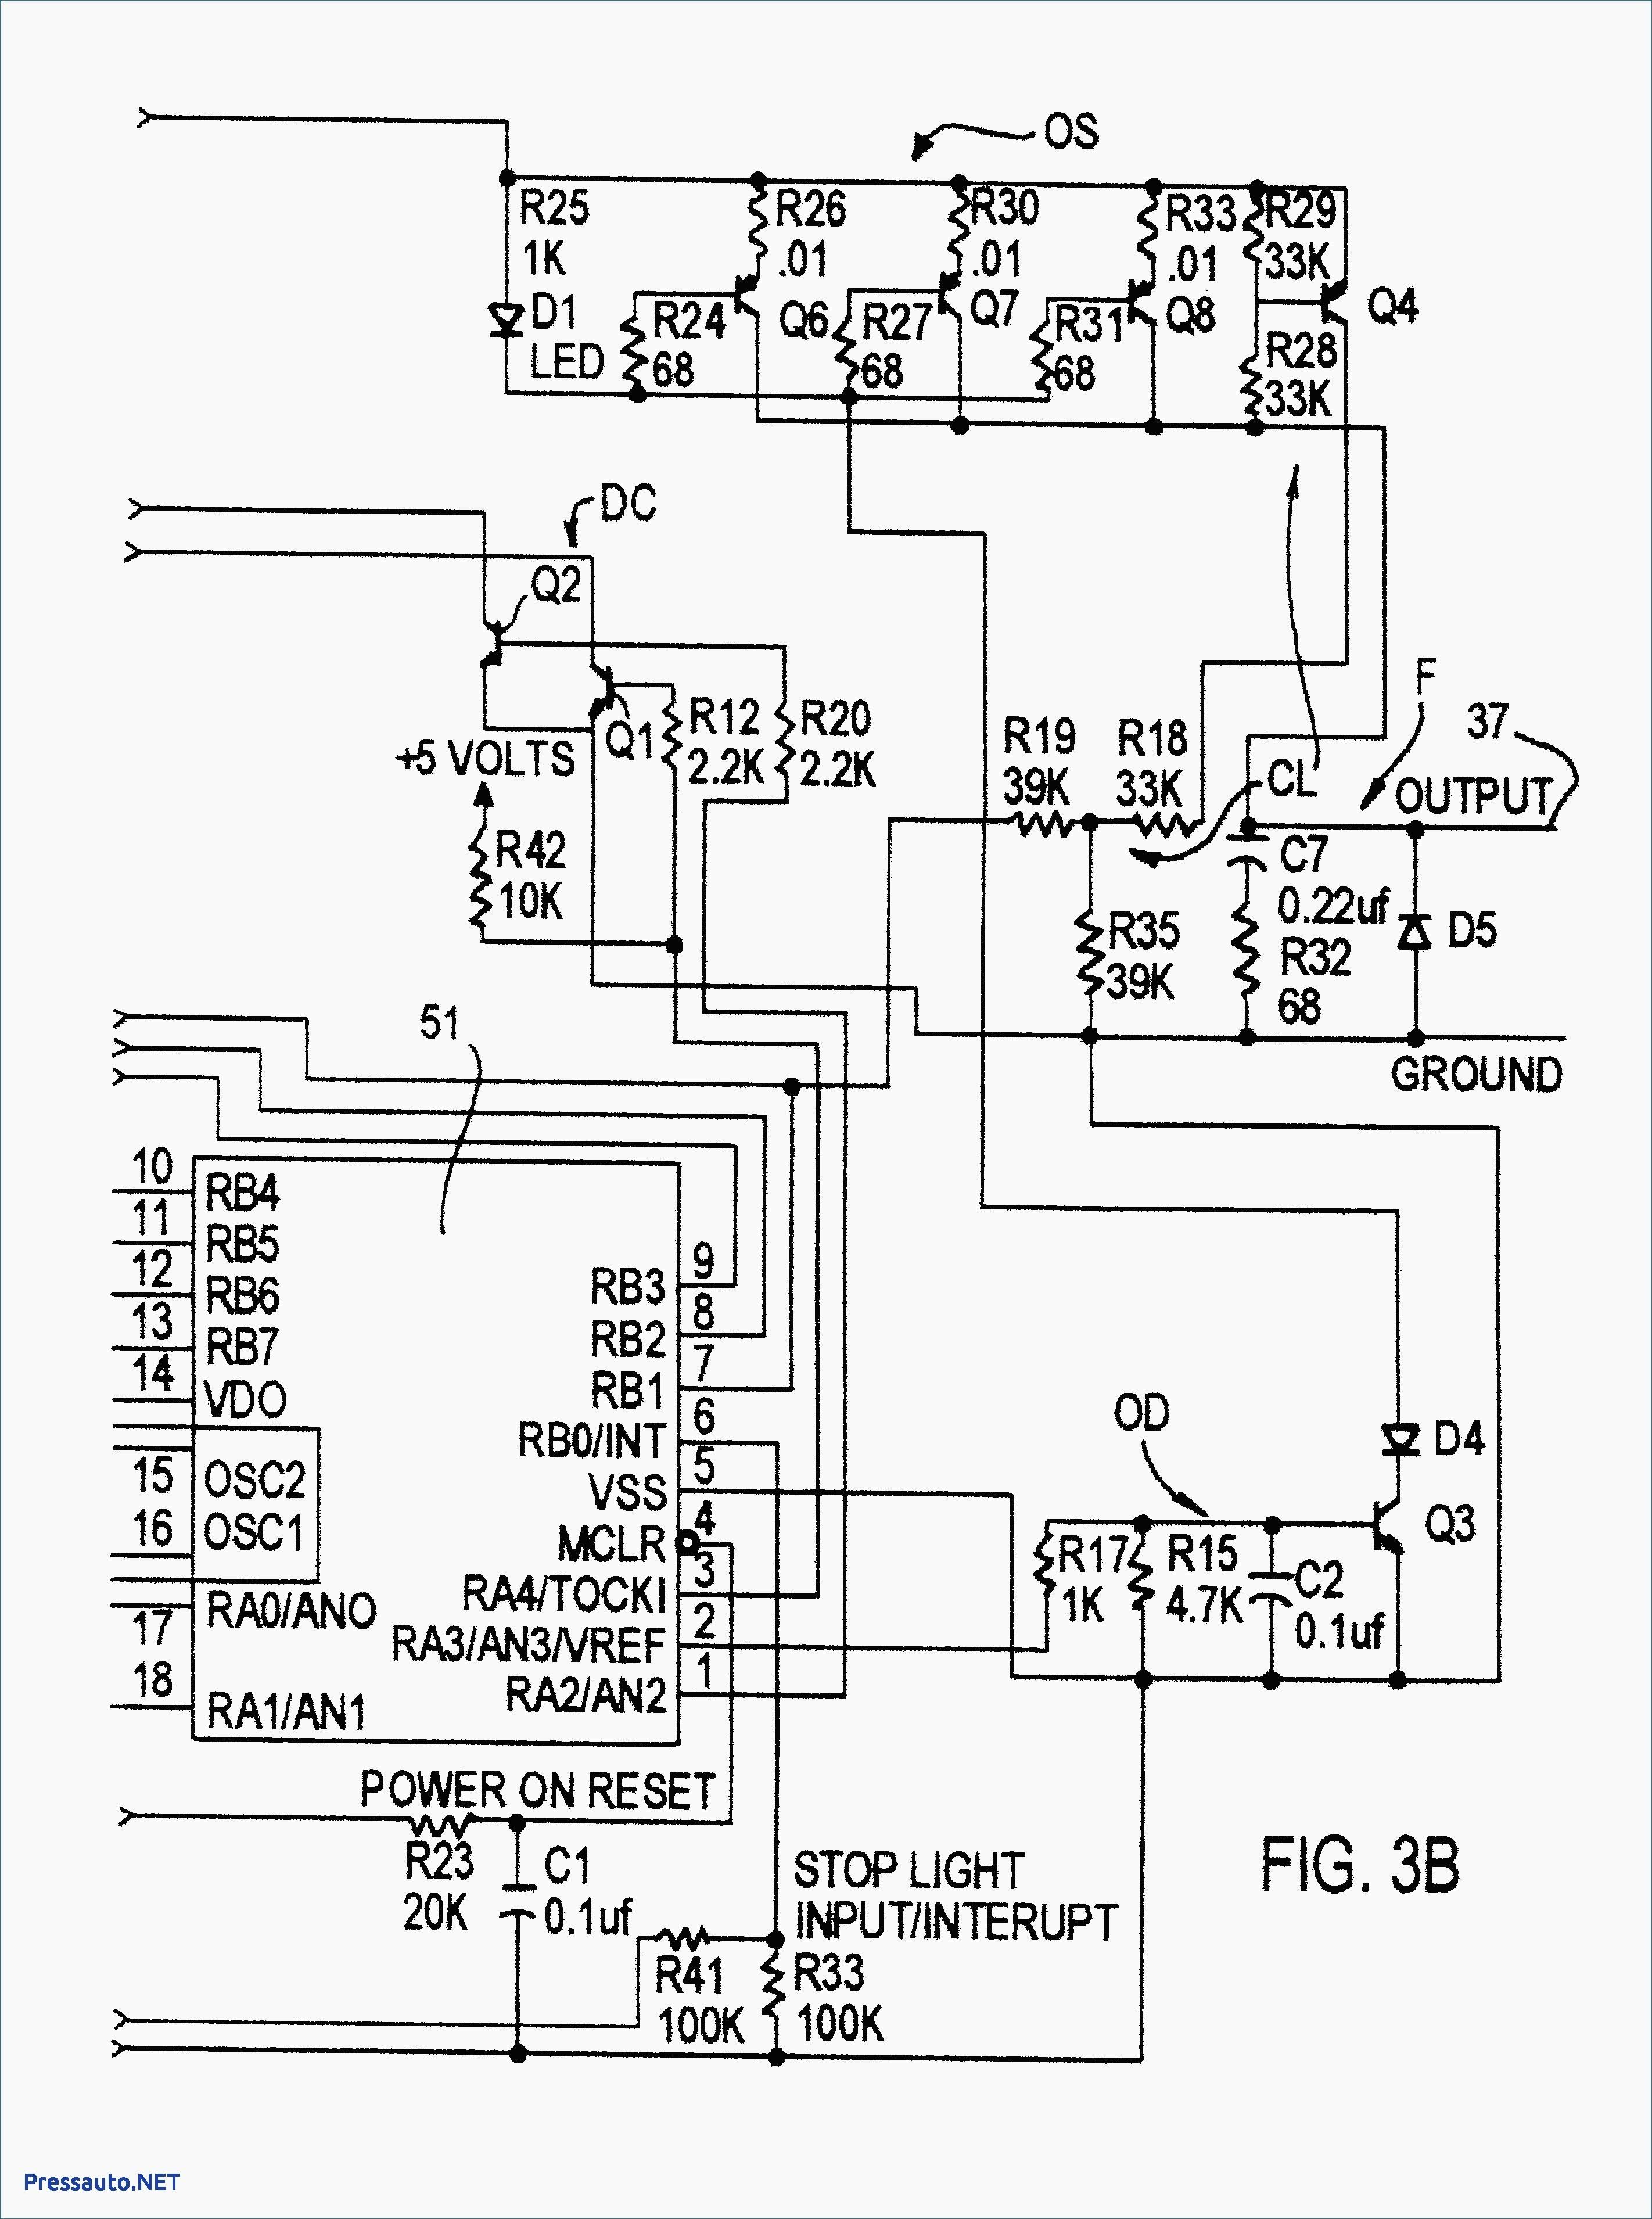 Electric Circuit Diagram Inspirational Wiring Diagram Electric Trailer Brake Control Trailer Brake